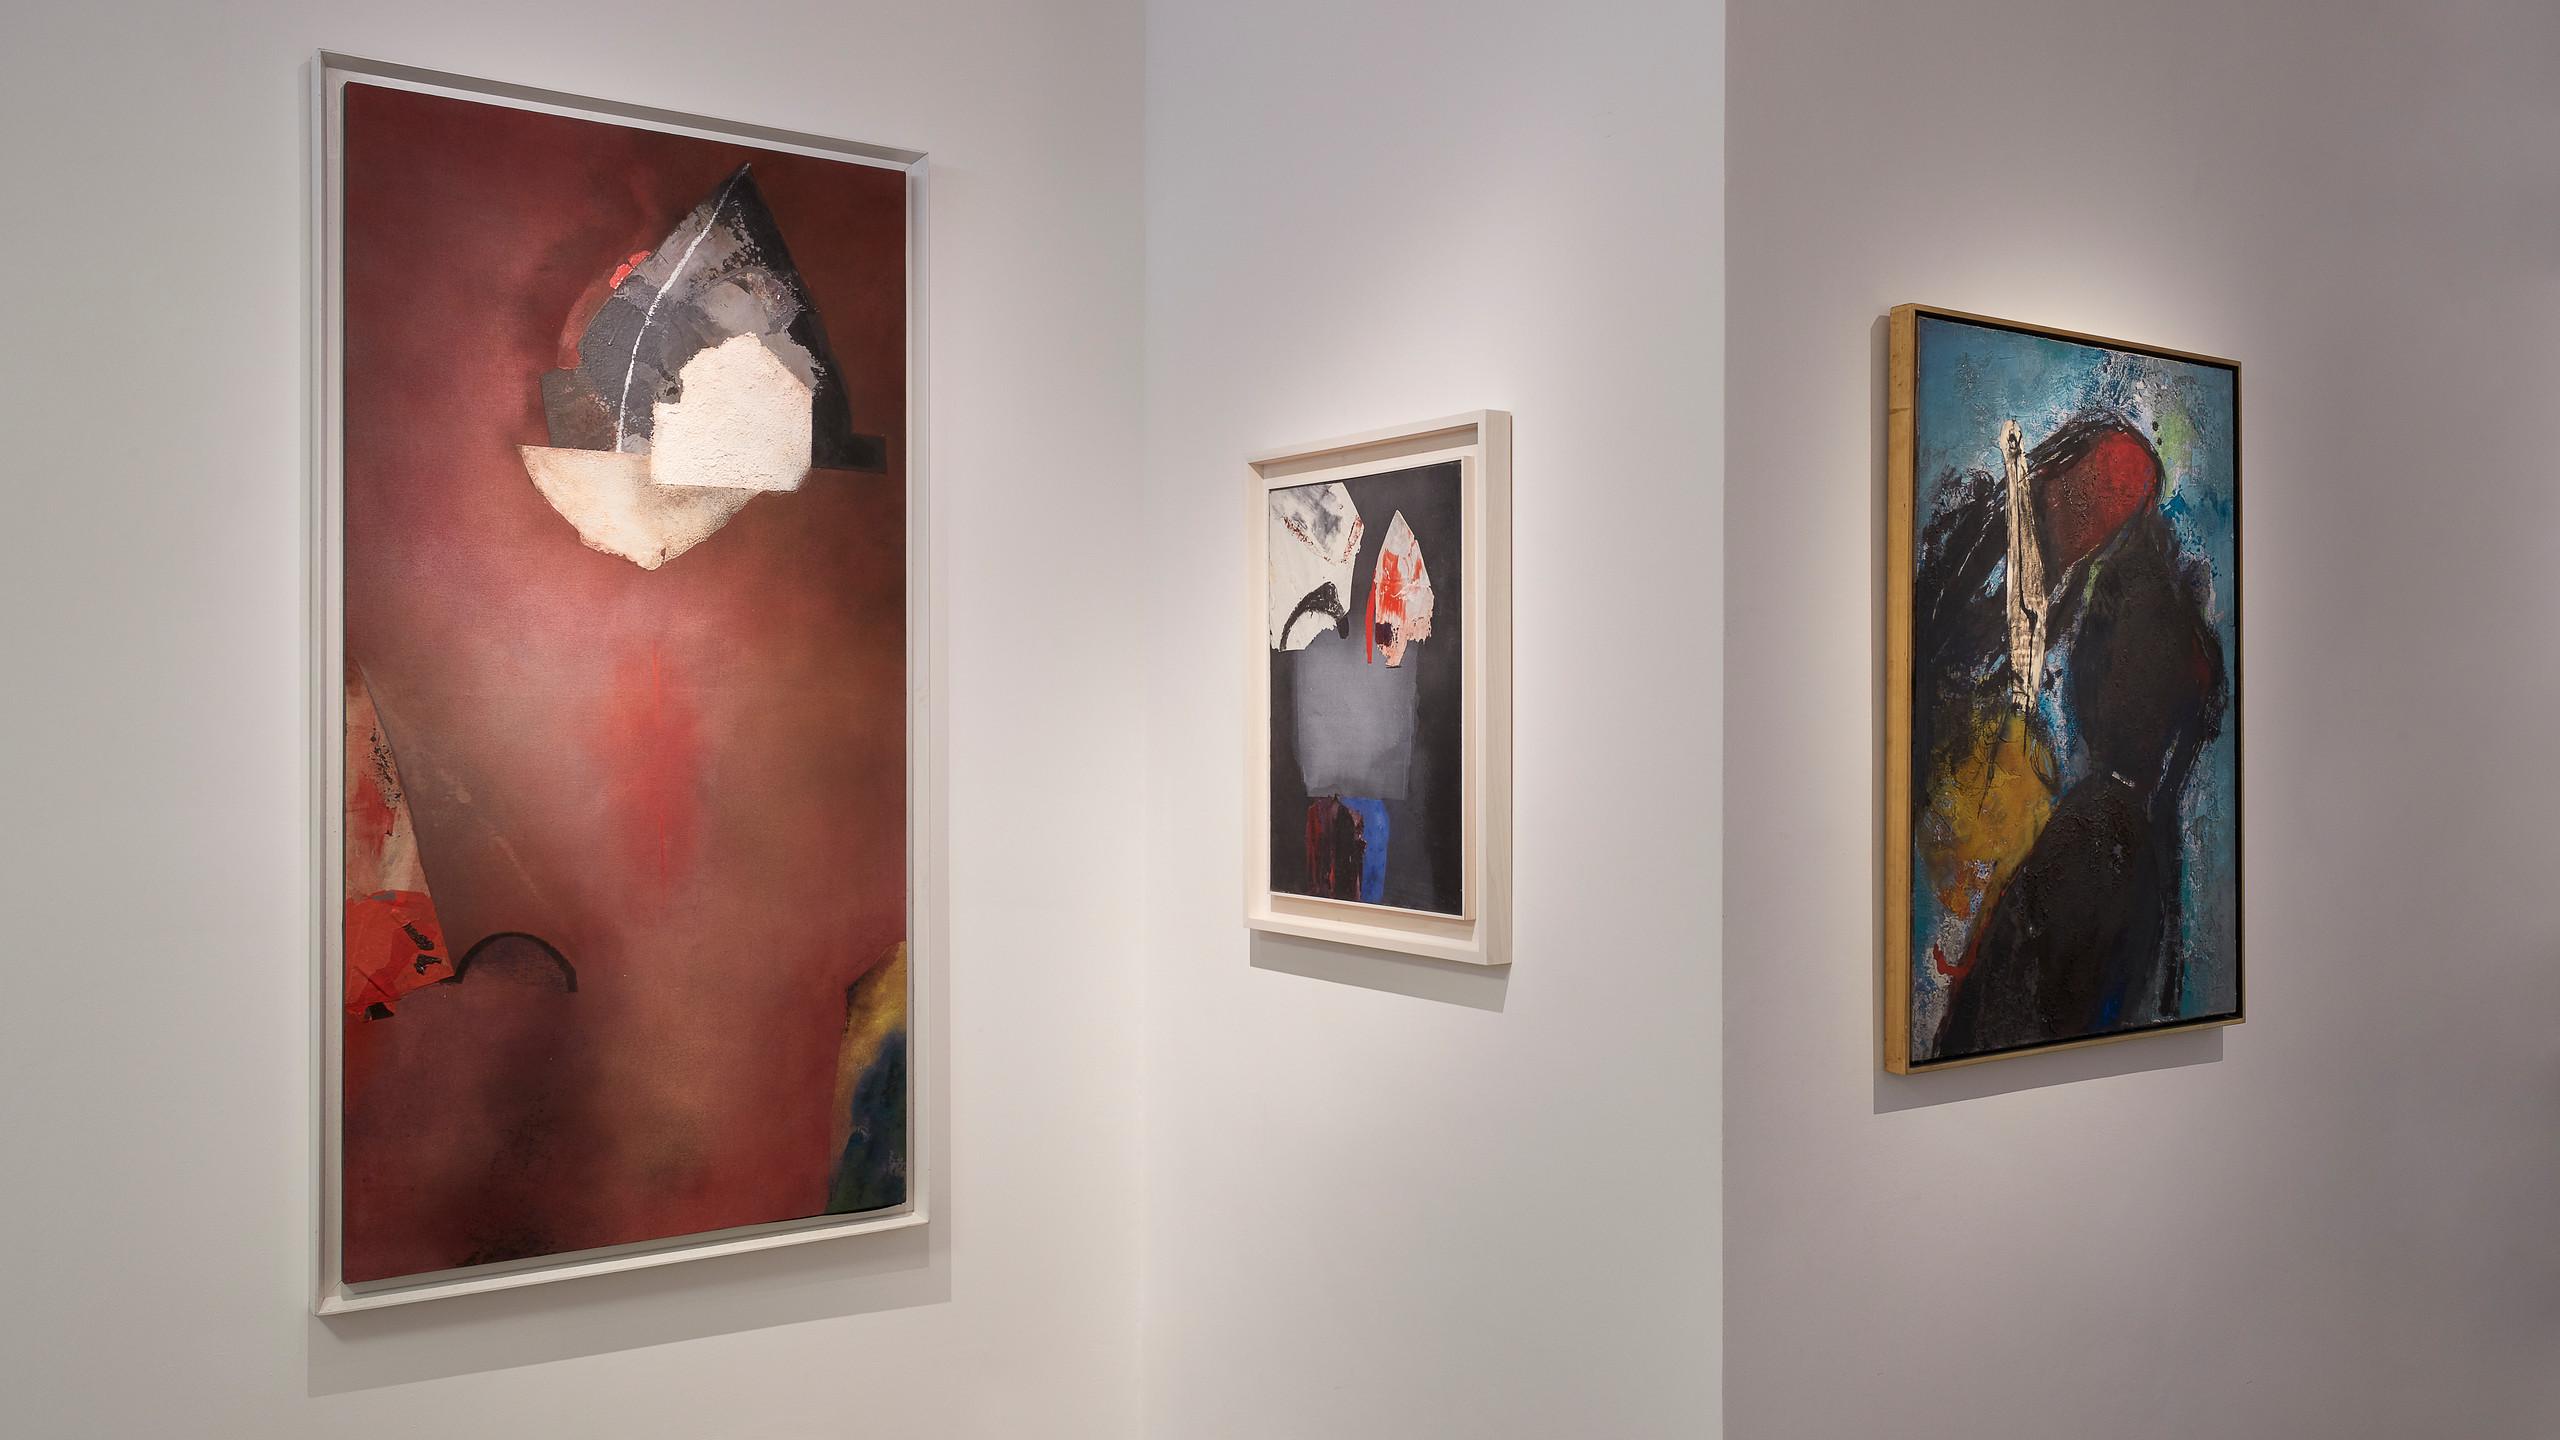 Installation view, Giuseppe Santomaso: Animated Painting, Cortesi Gallery, London, 2019. Photo: Luke A. Walker